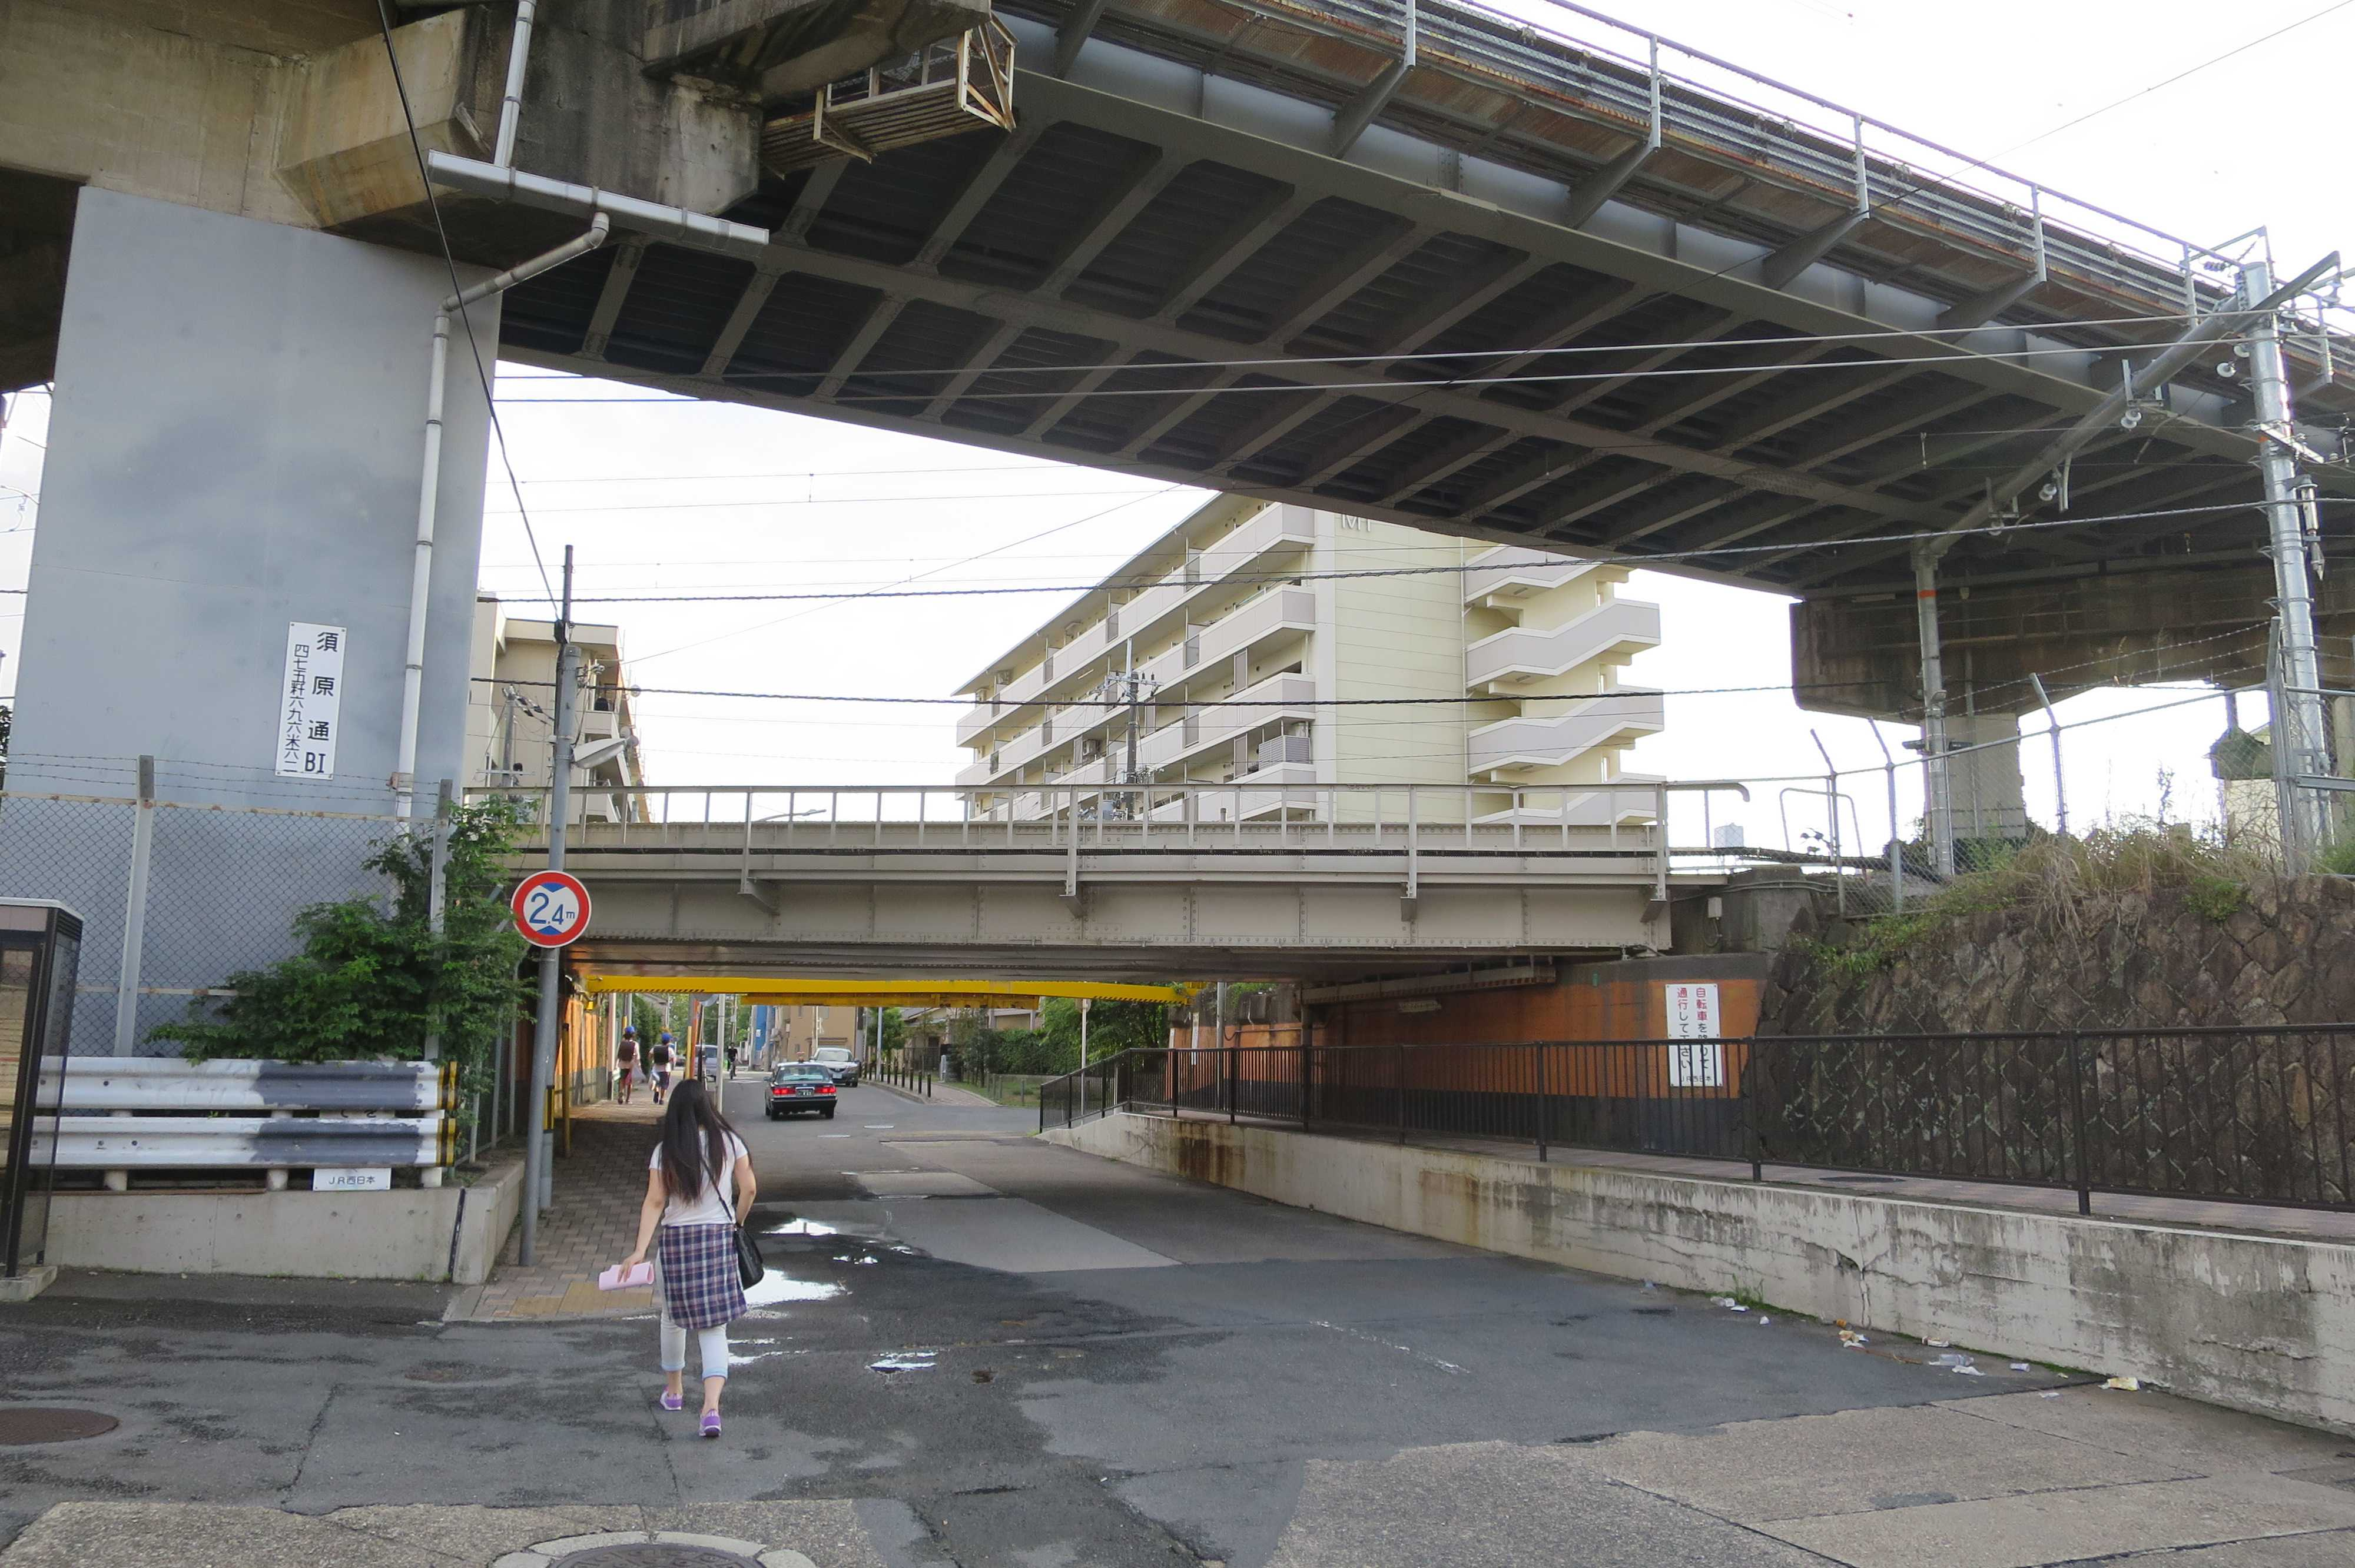 京都・崇仁地区 - 手前が東海道新幹線、奥がJR奈良線の高架